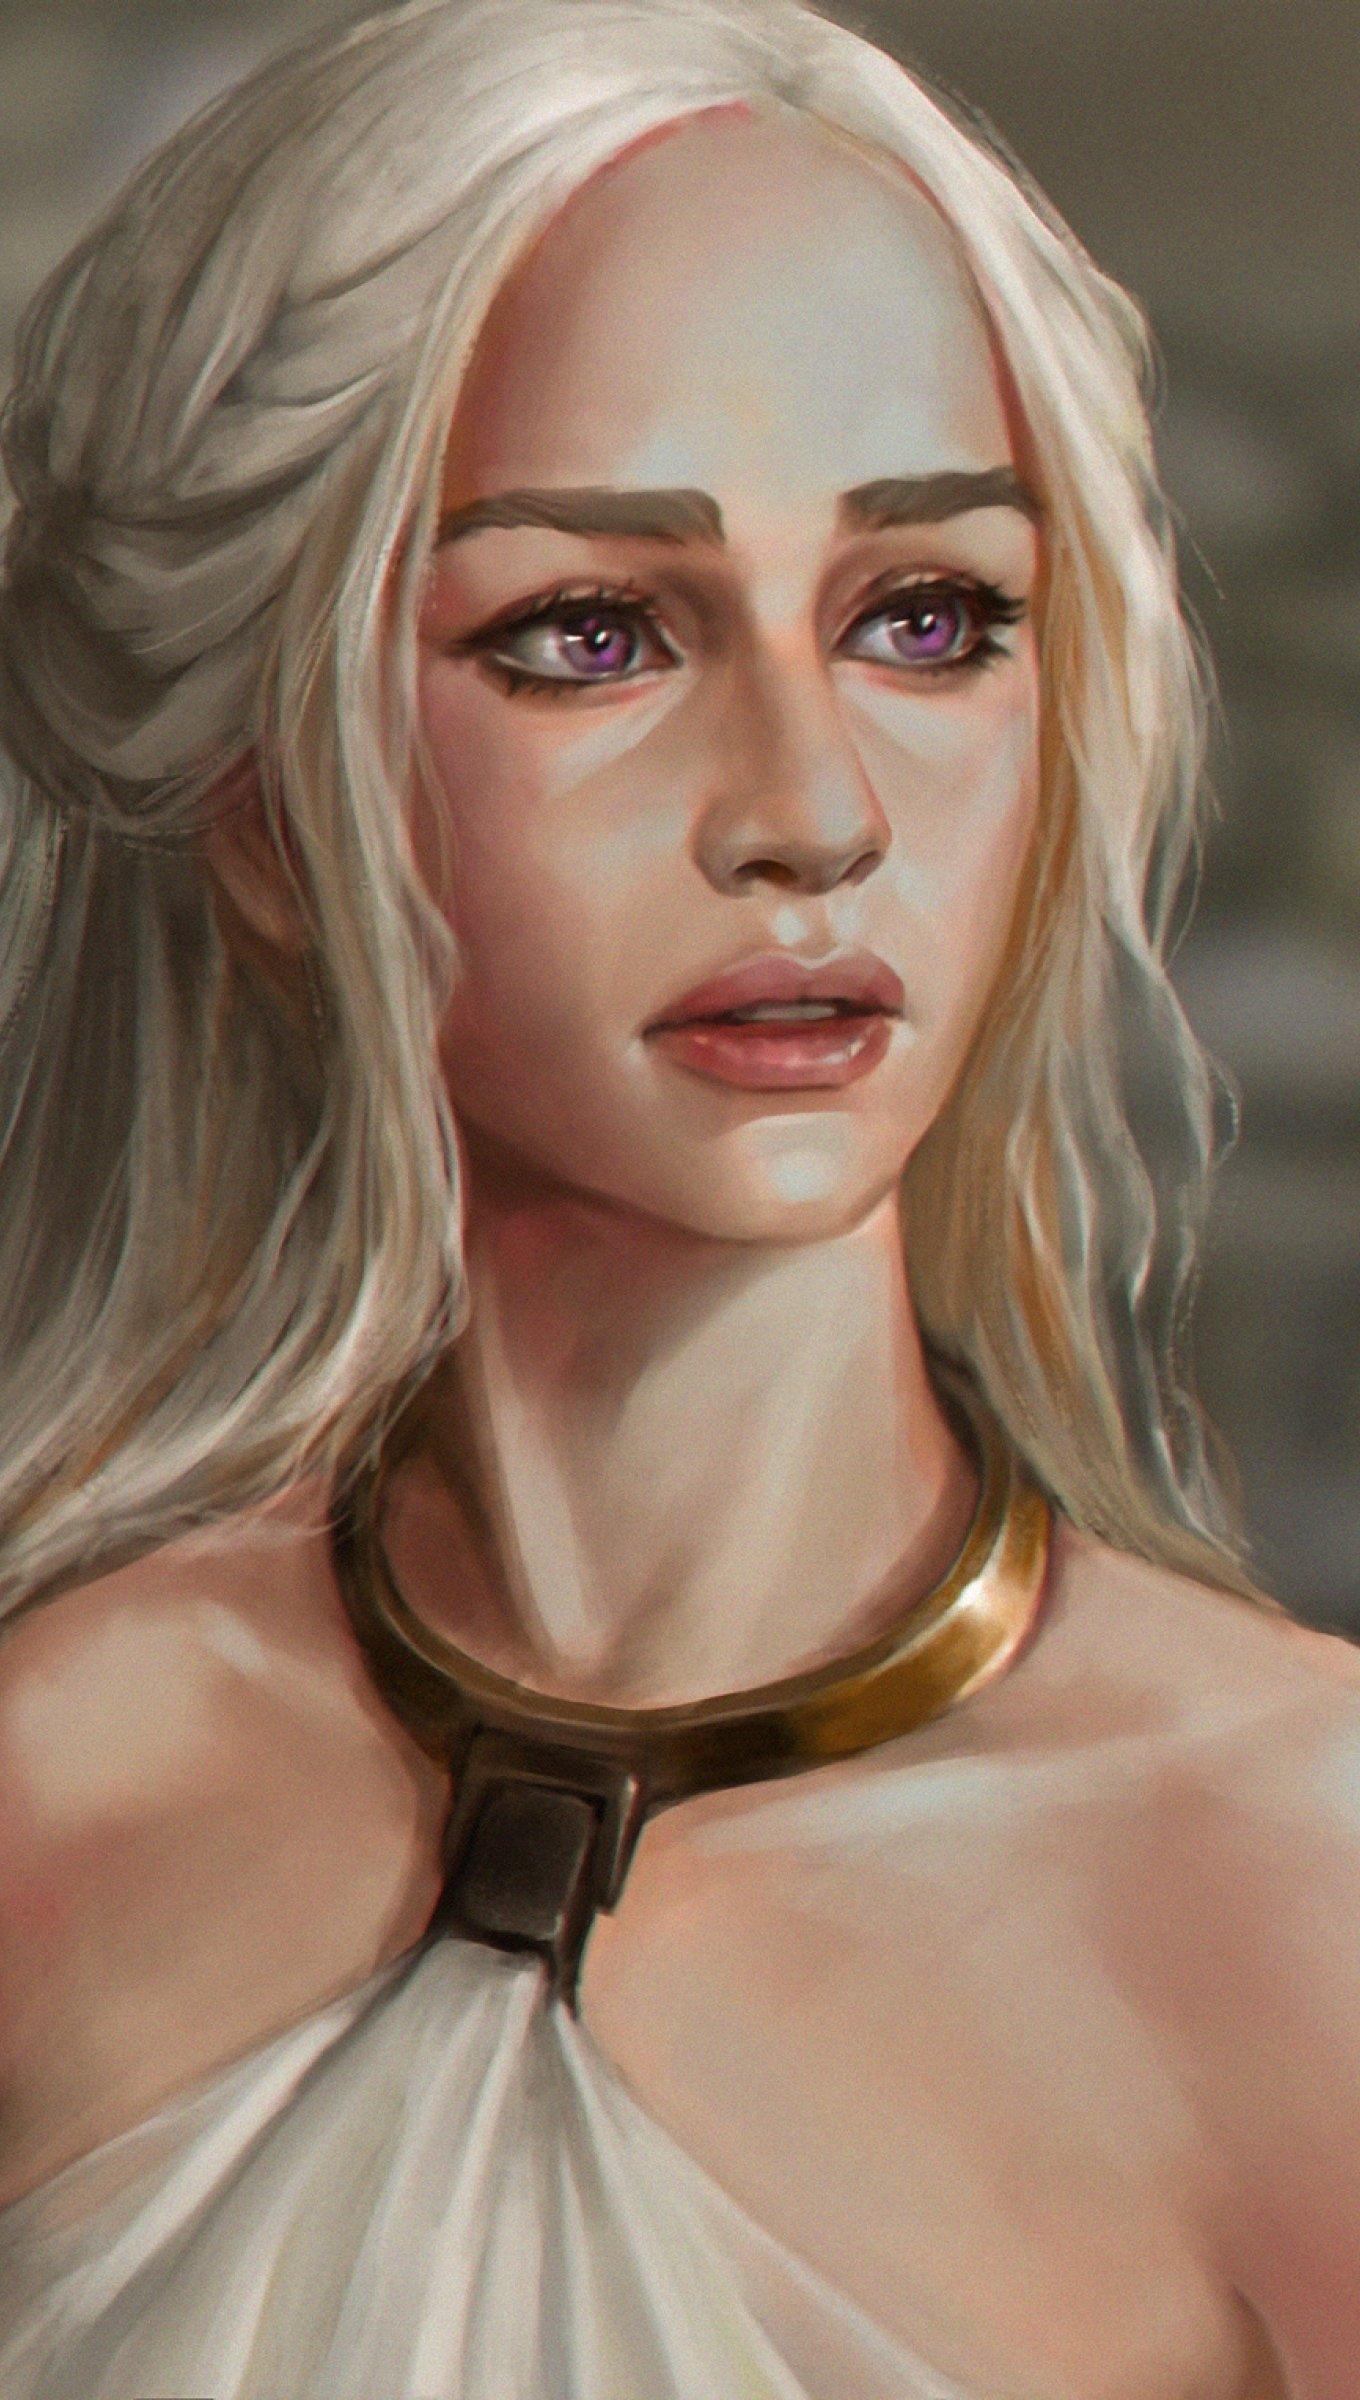 Fondos de pantalla Daenerys Tagaryen Fanart Vertical